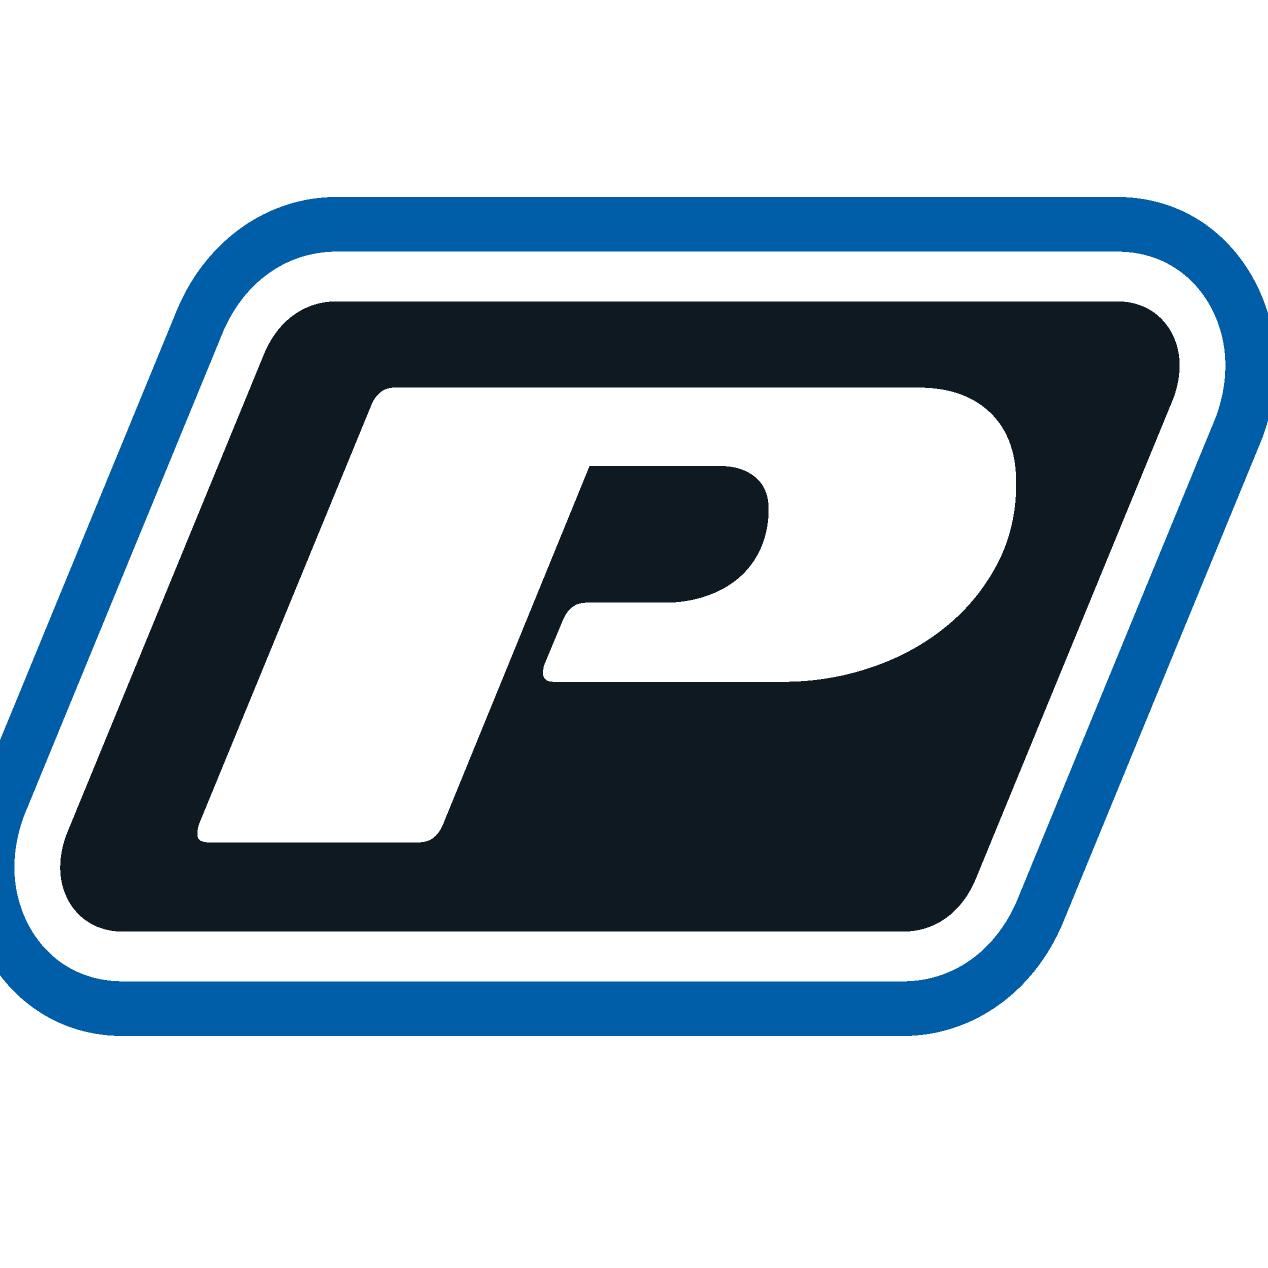 Piercey Honda image 5